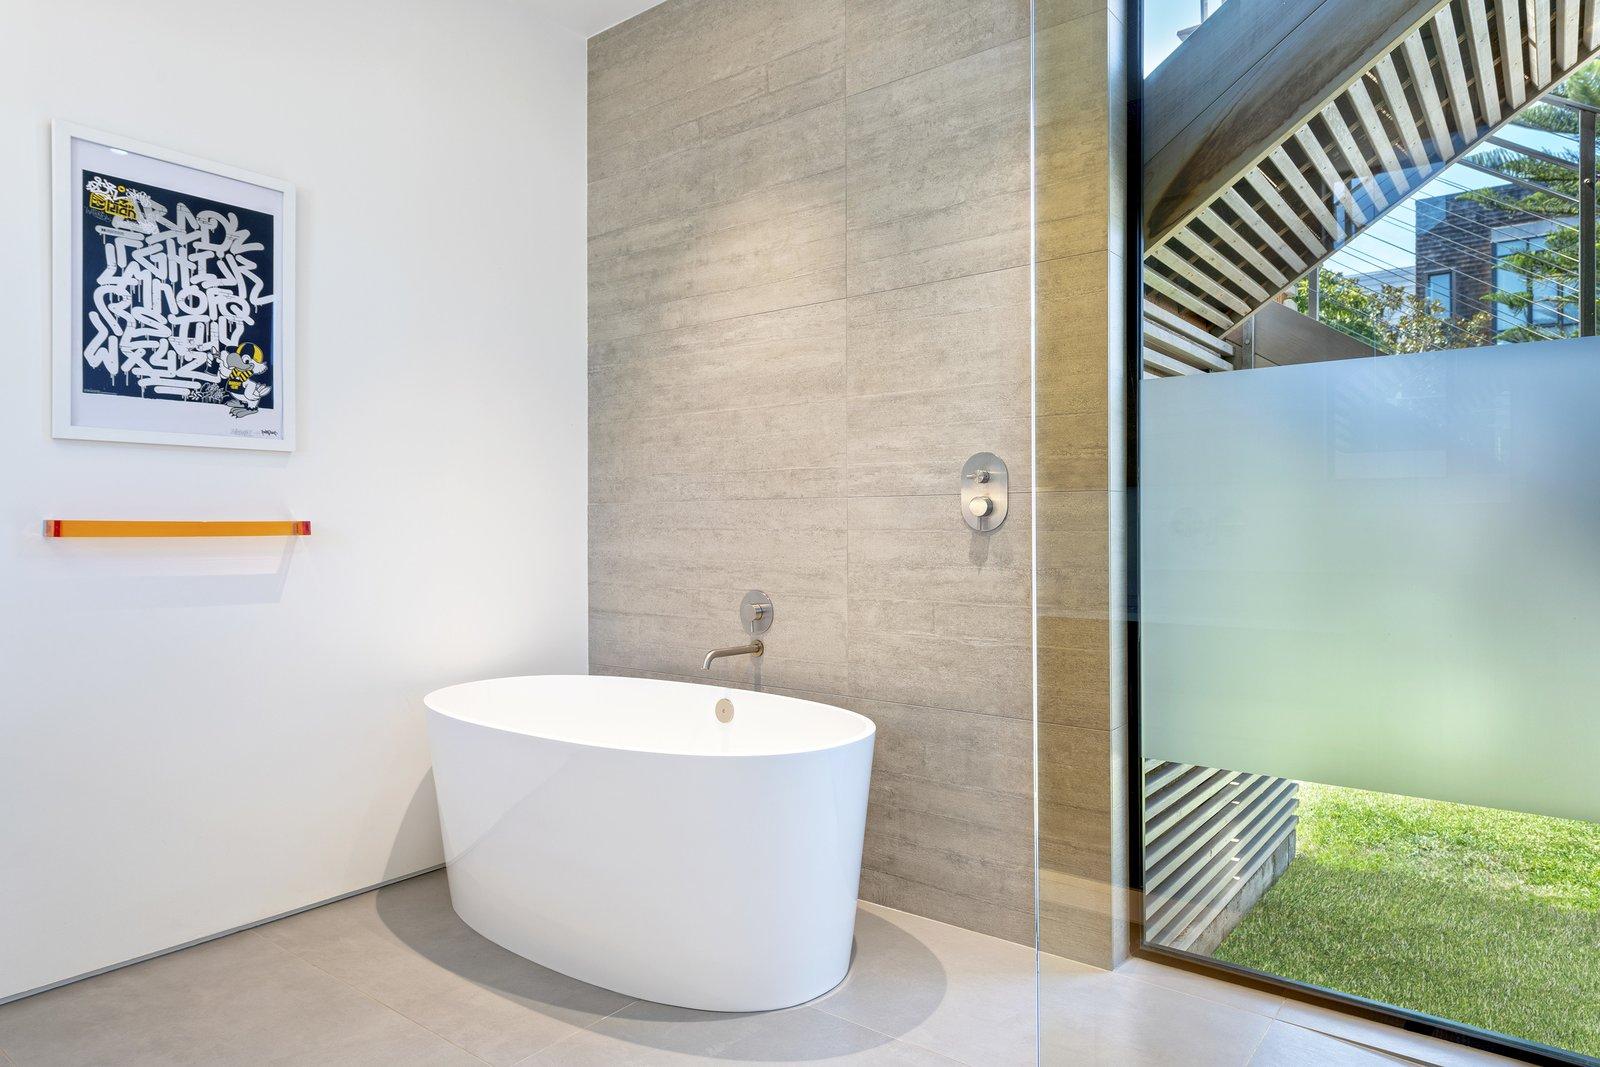 Bath Room and Freestanding Tub Main Bath  Precita Park Residence by Studio Sarah Willmer, Architecture